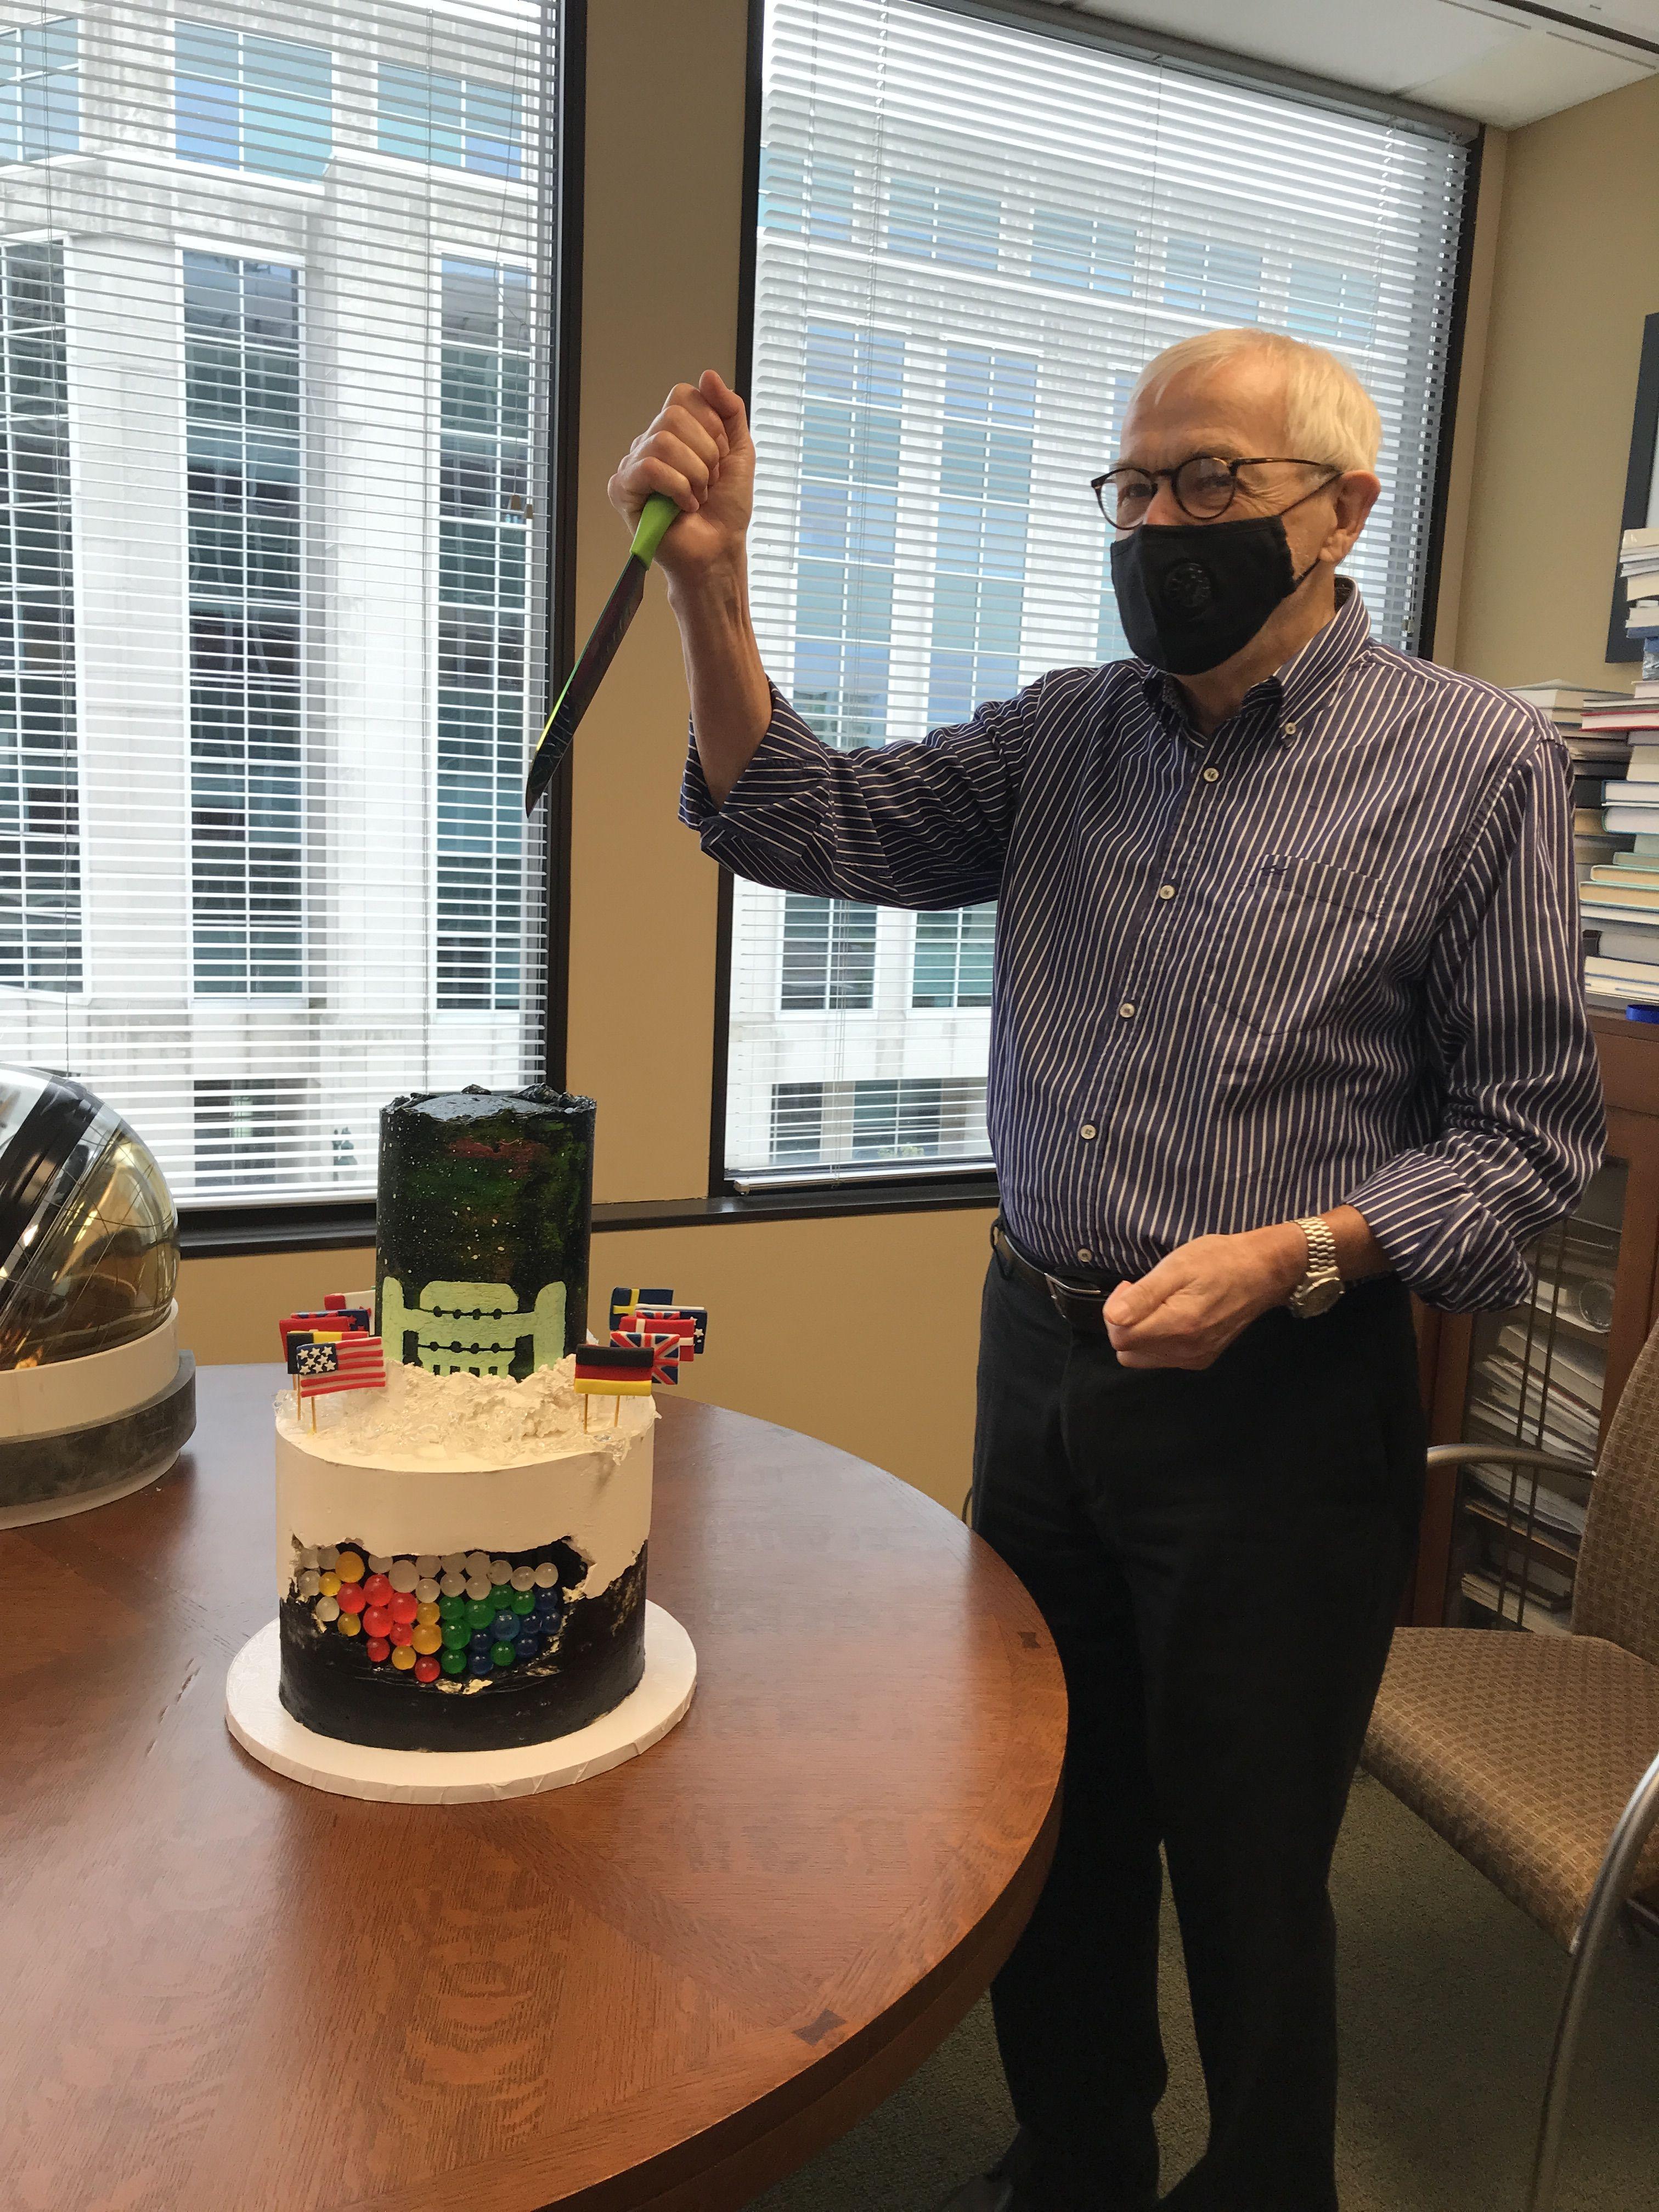 Francis Halzen cutting the cake.